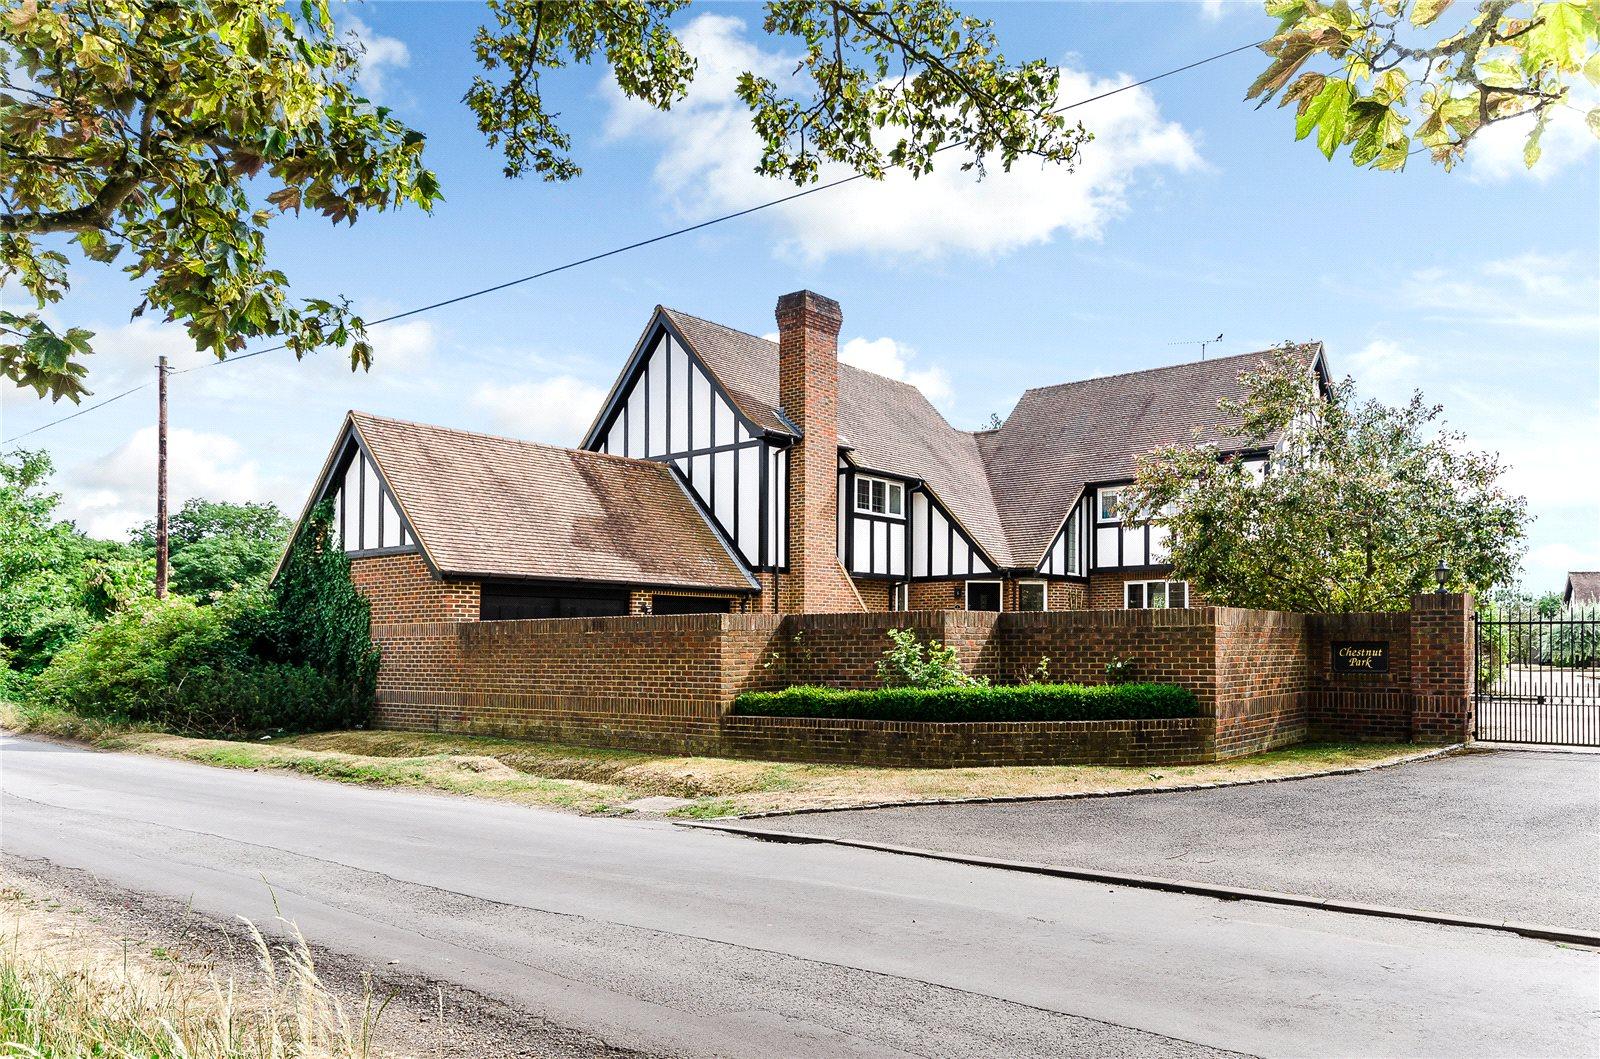 Casa para uma família para Venda às Chestnut Park, Bray, Maidenhead, Berkshire, SL6 Maidenhead, Inglaterra